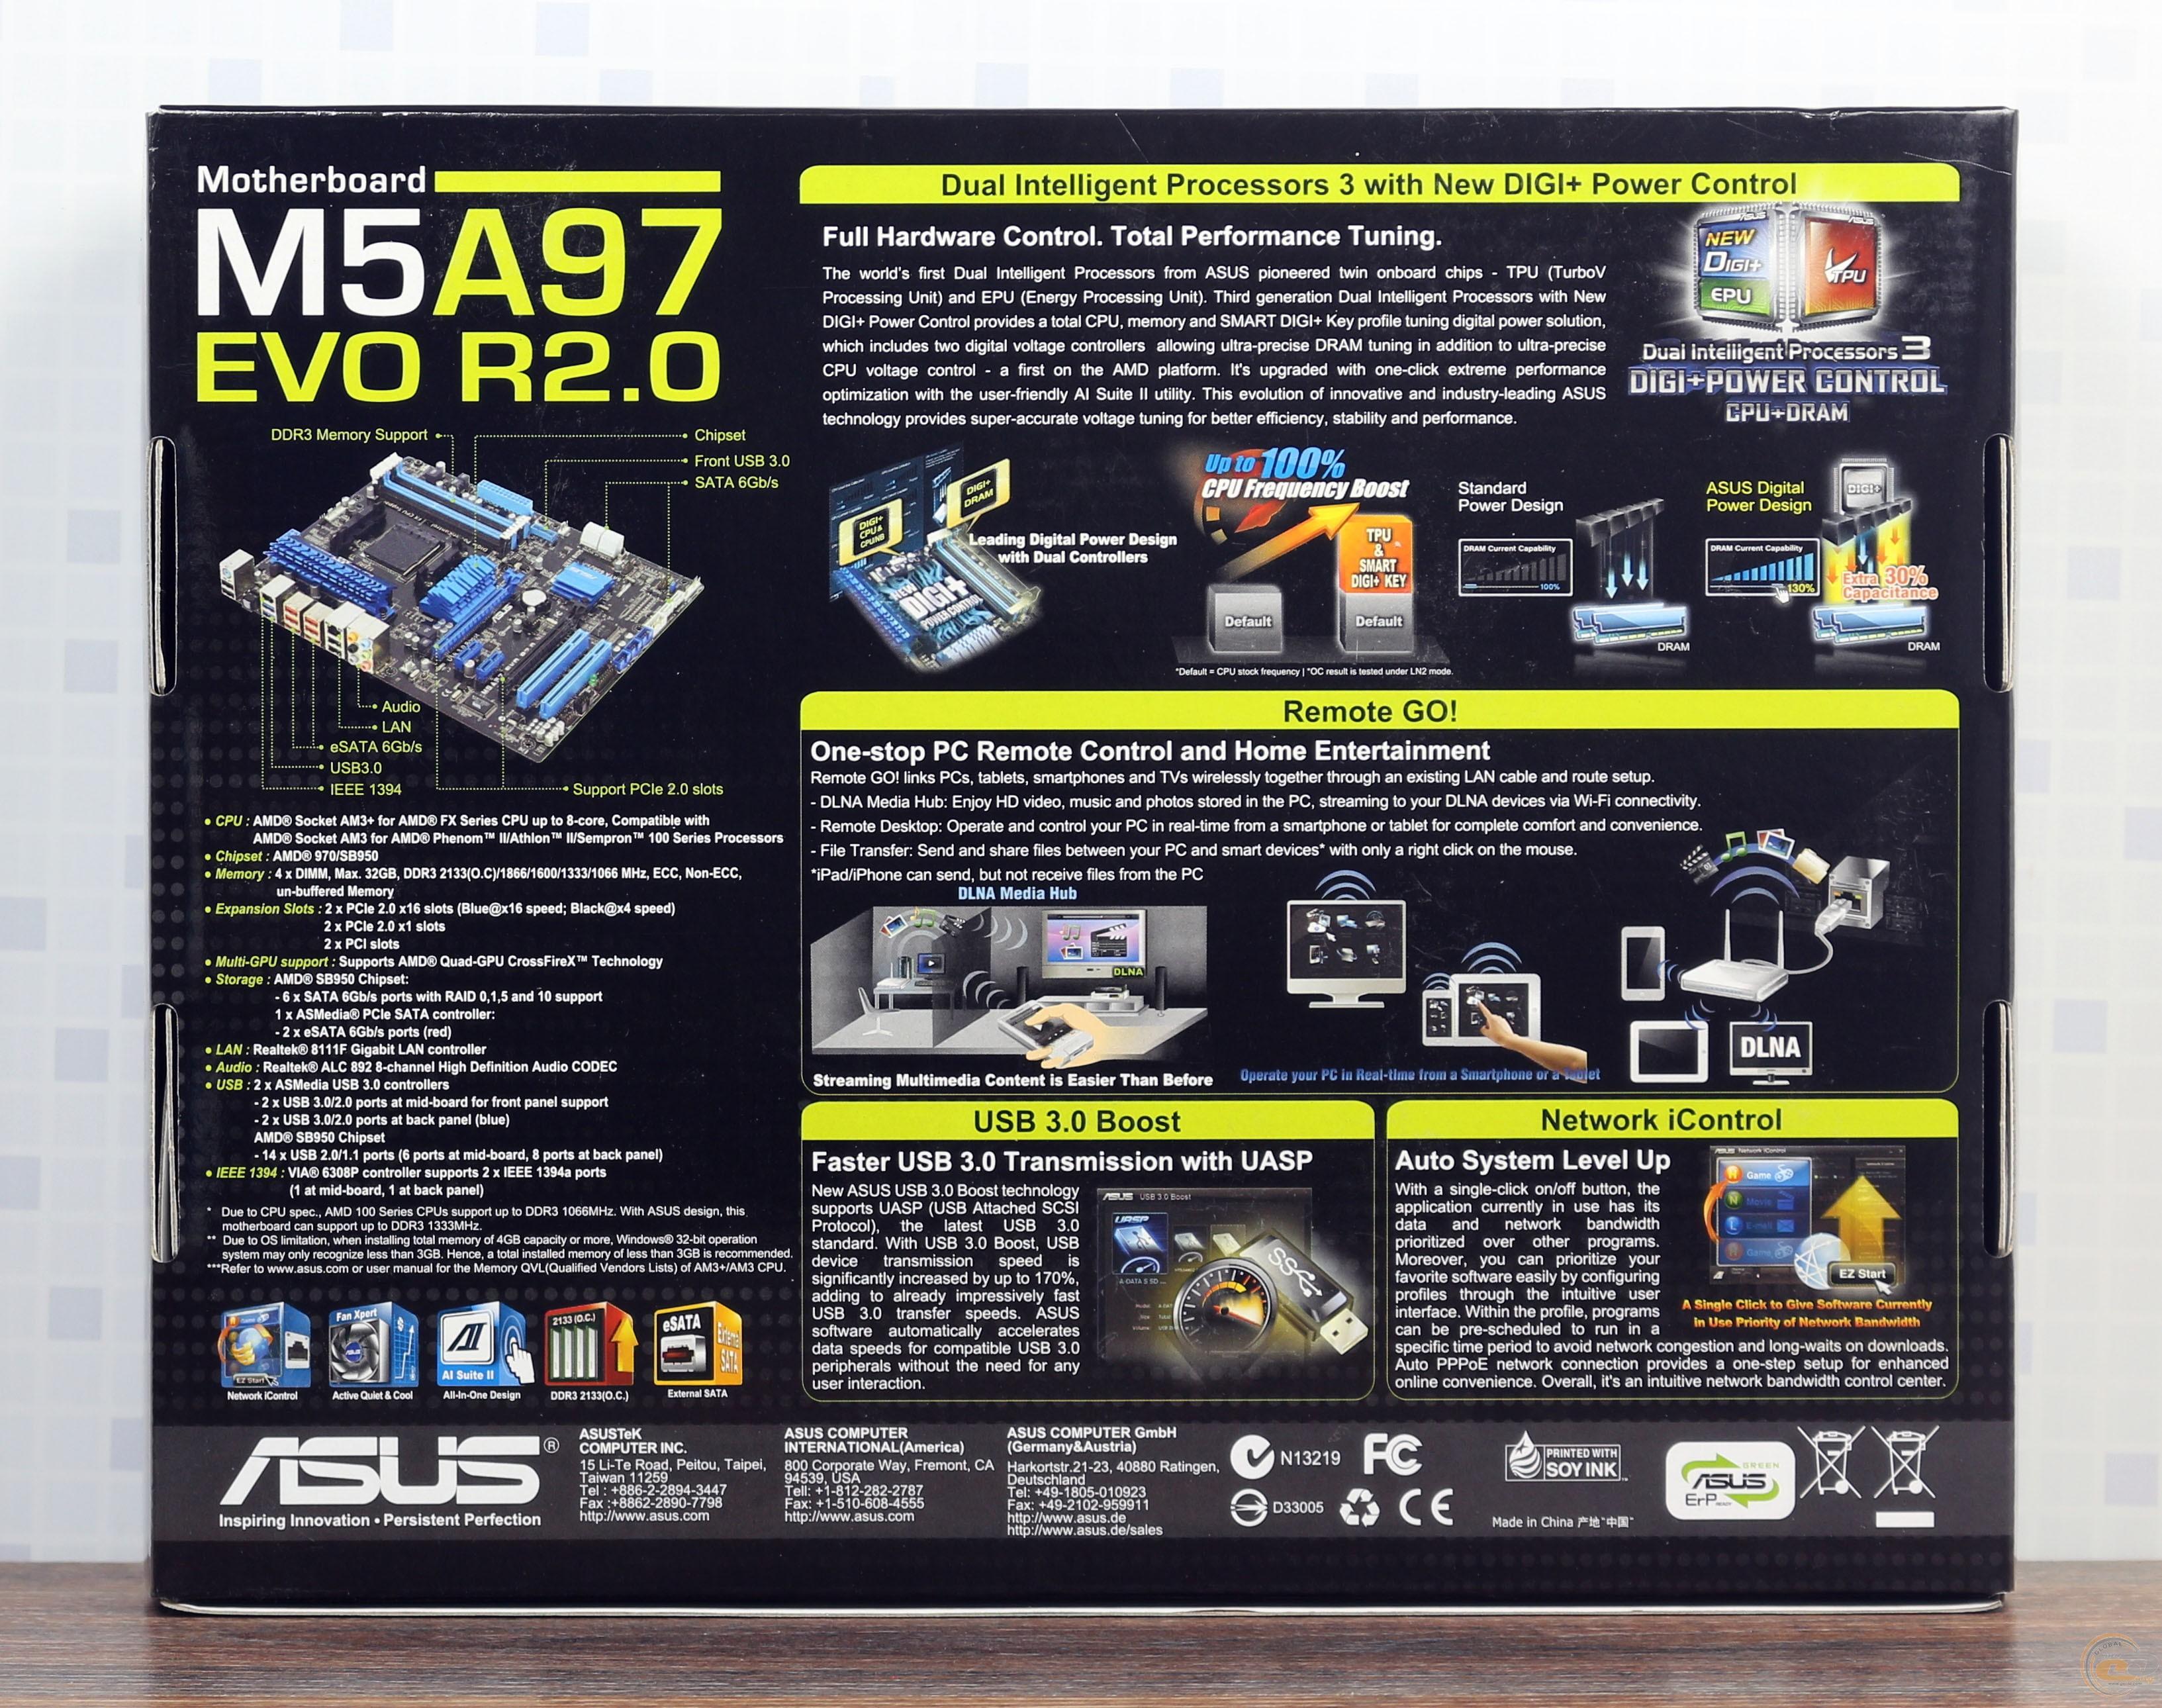 m5a97 evo r2 0 manual